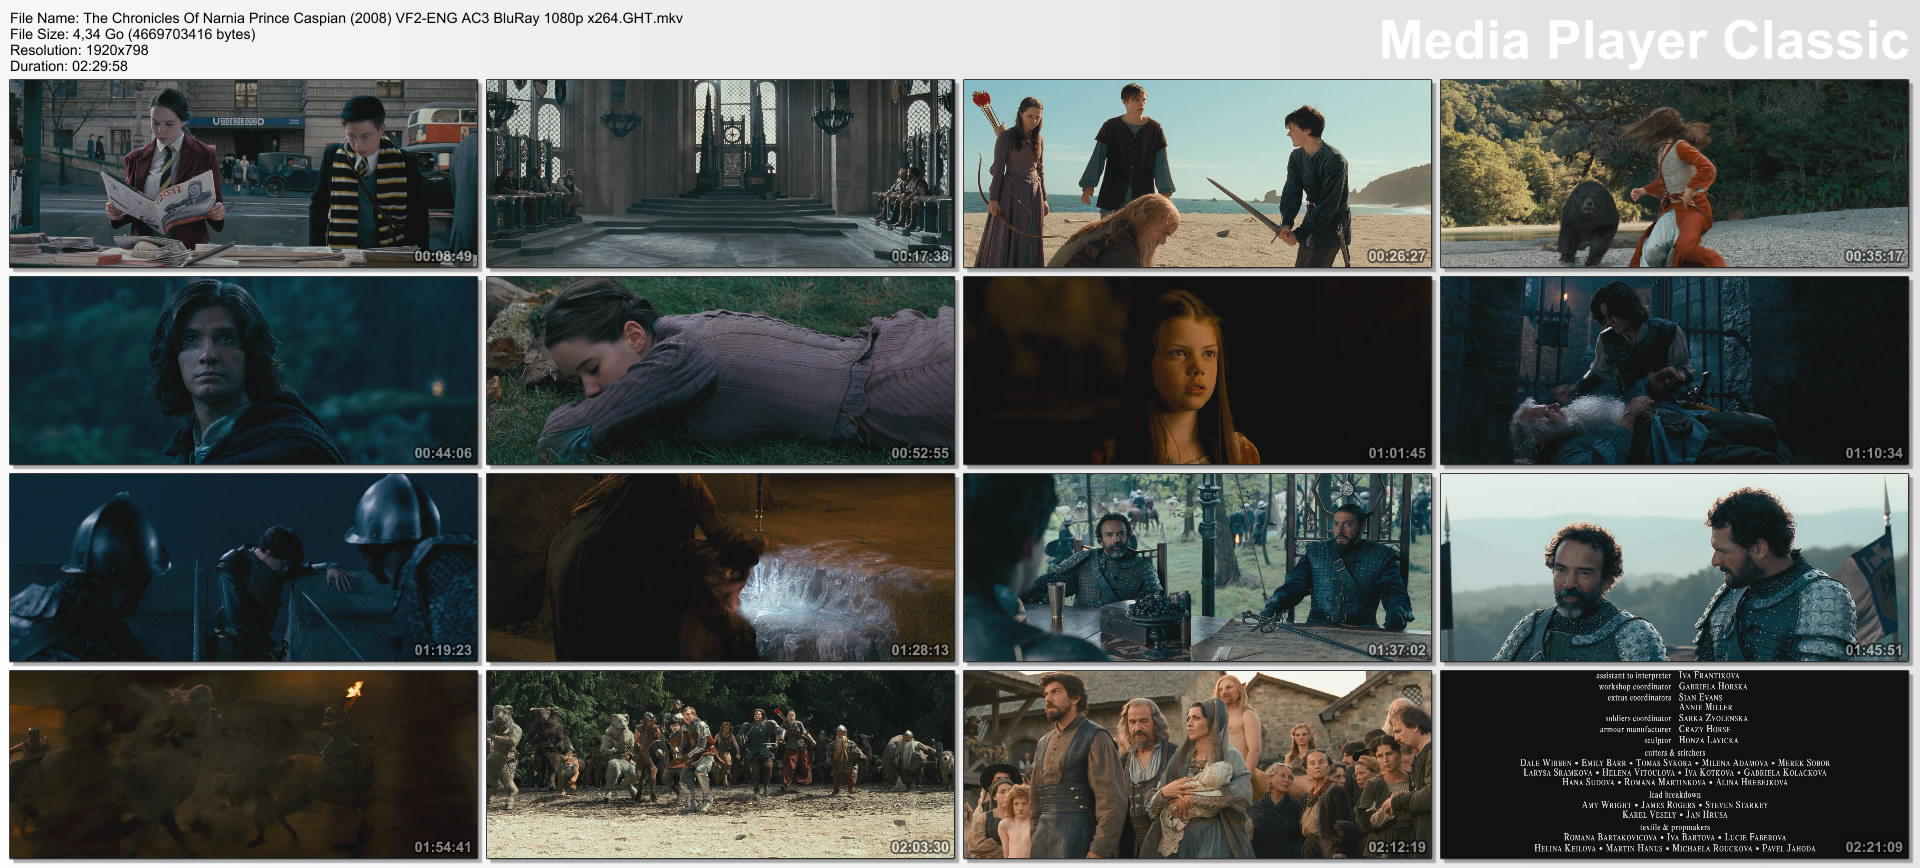 The Chronicles Of Narnia Prince Caspian (2008) VF2-ENG AC3 BluRay 1080p x264.GHT